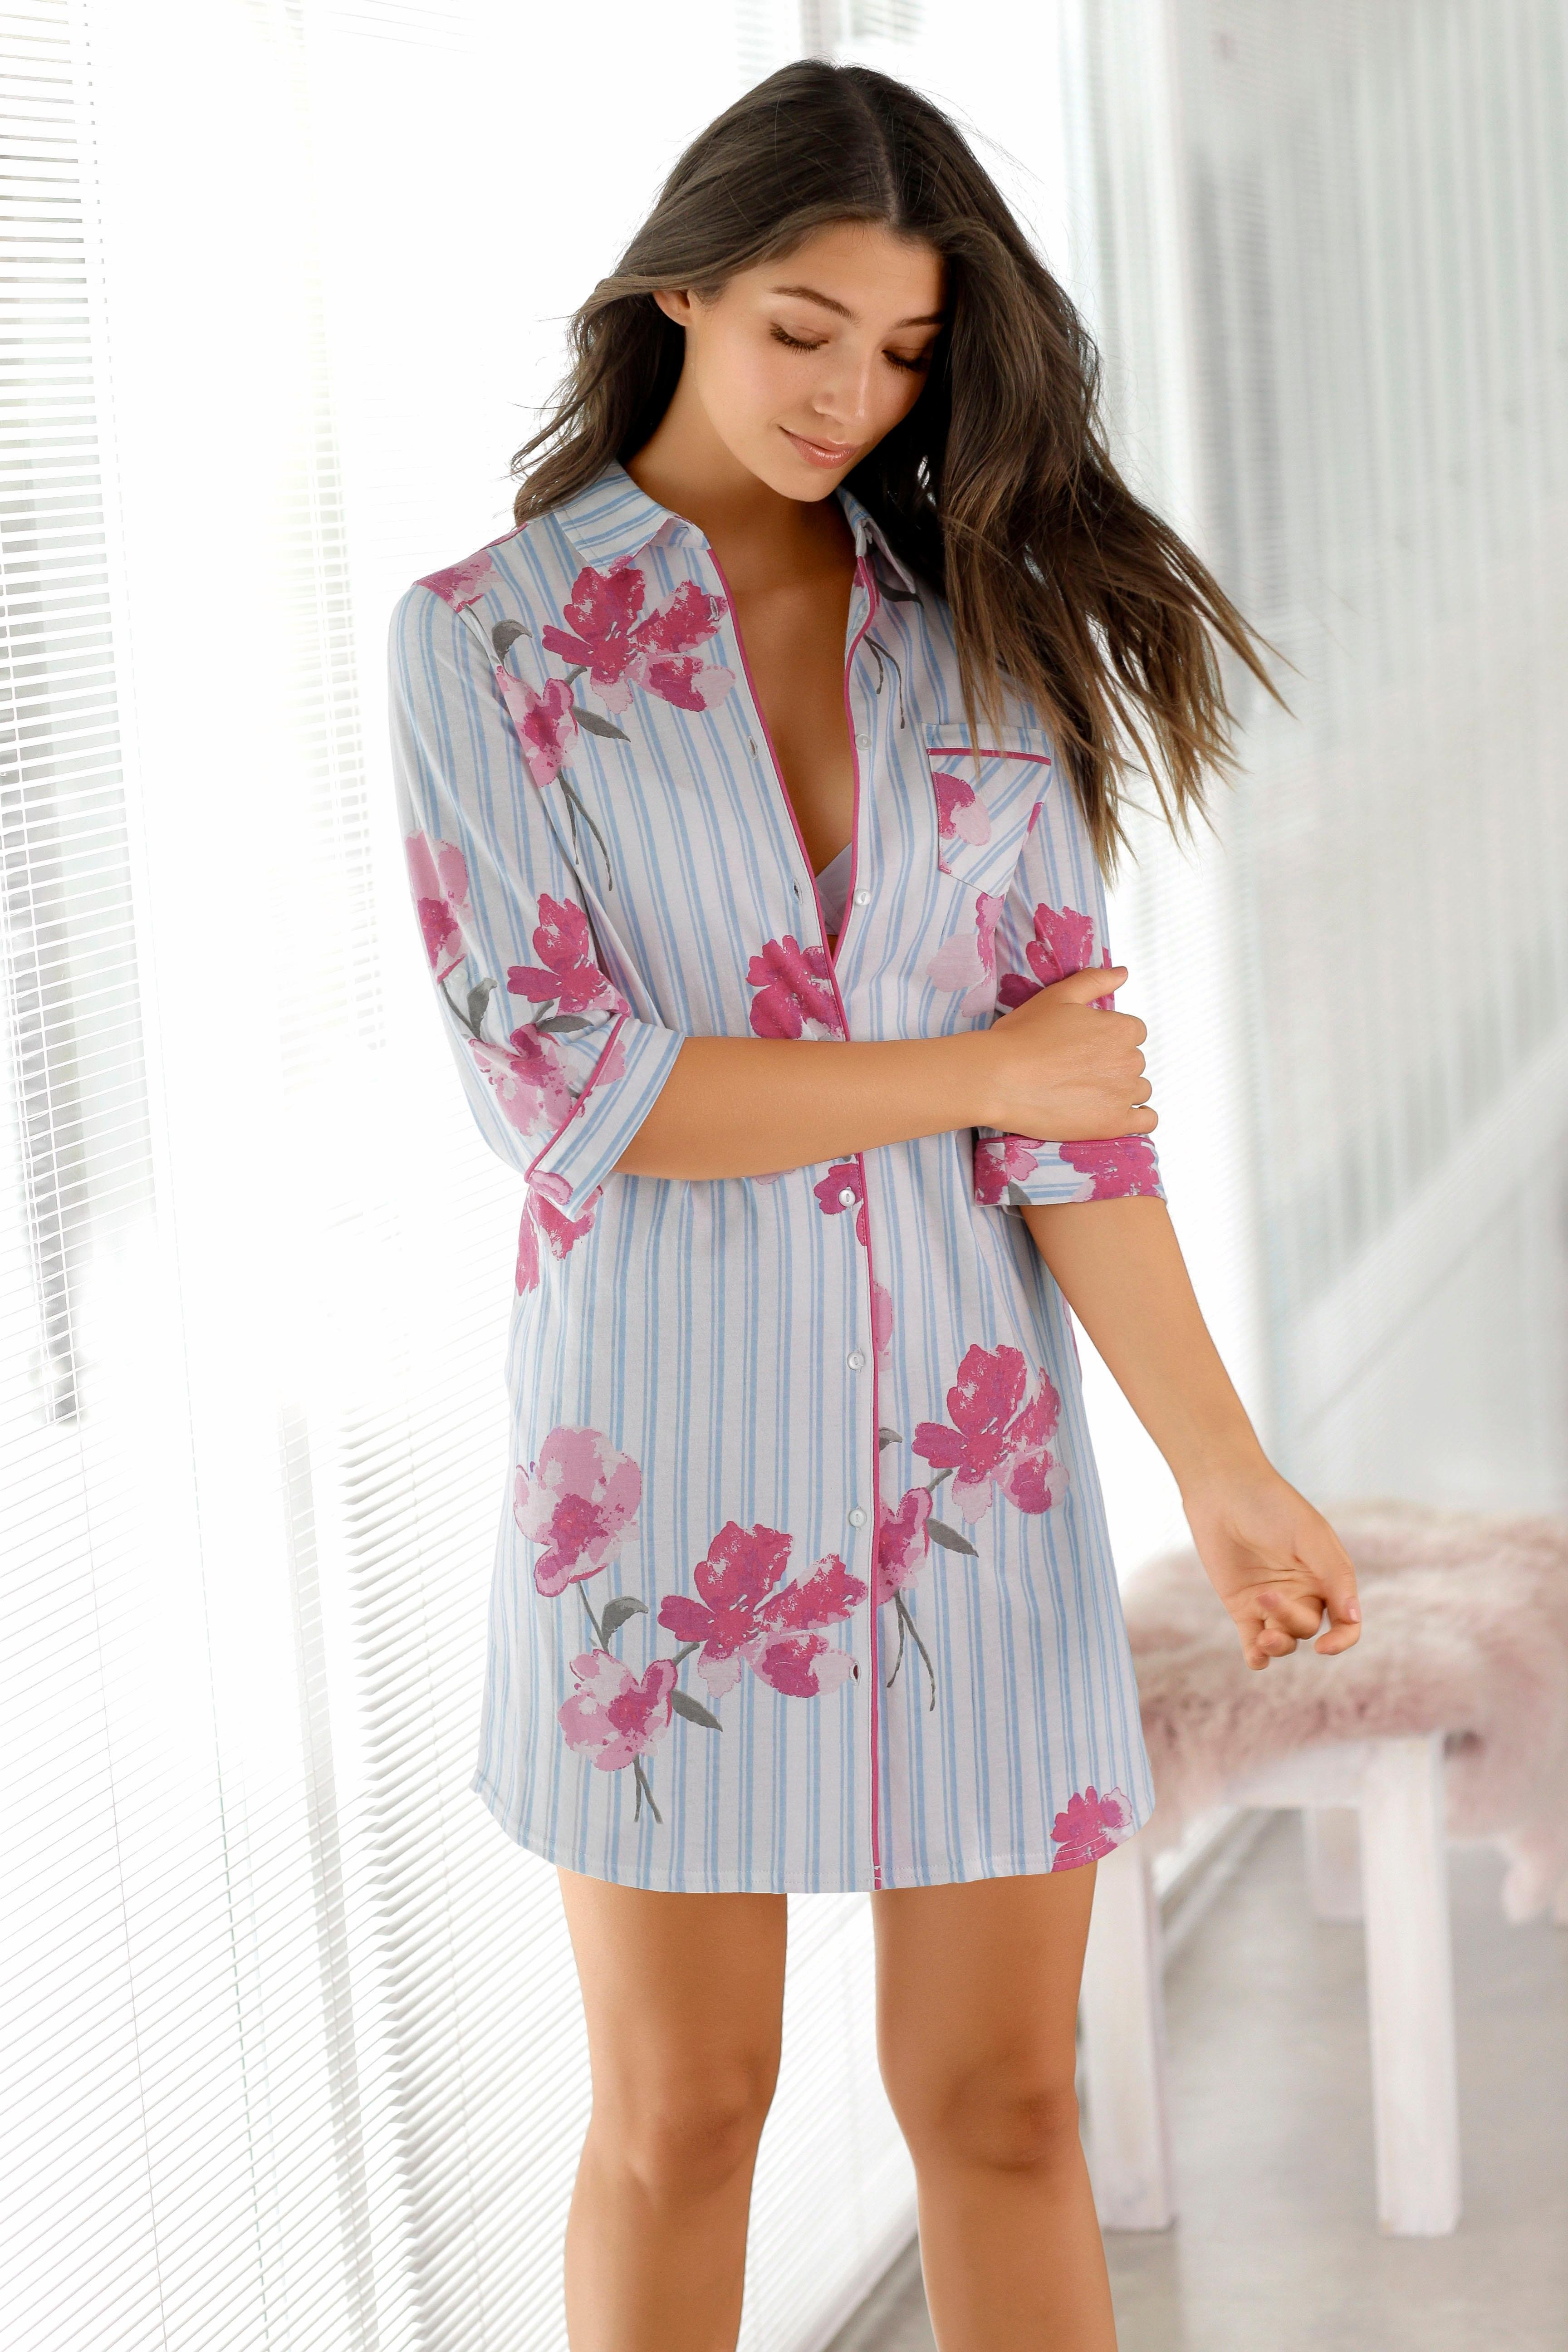 vivance collection nachthemd bij Lascana online kopen